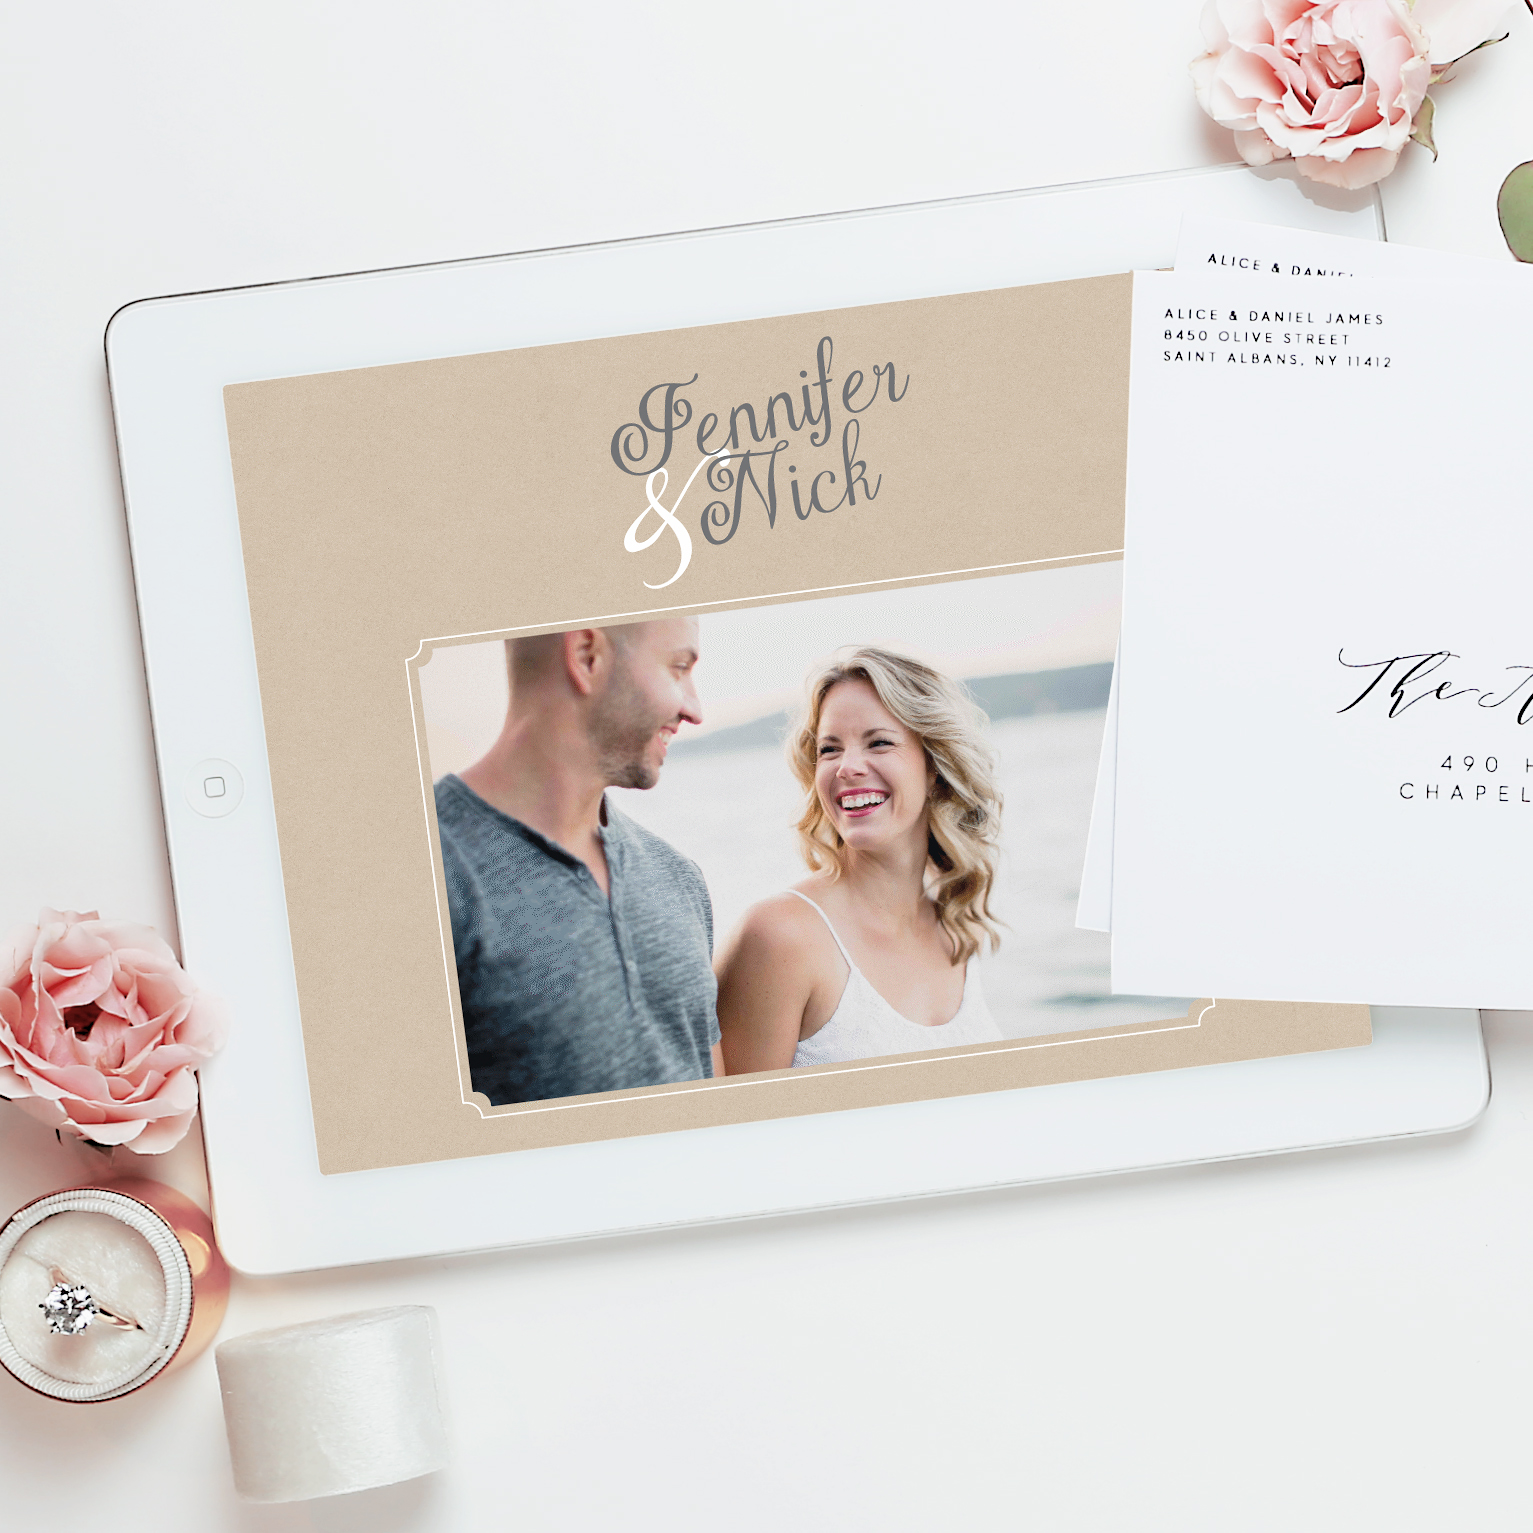 Wedding Stationary Website free Basic invite